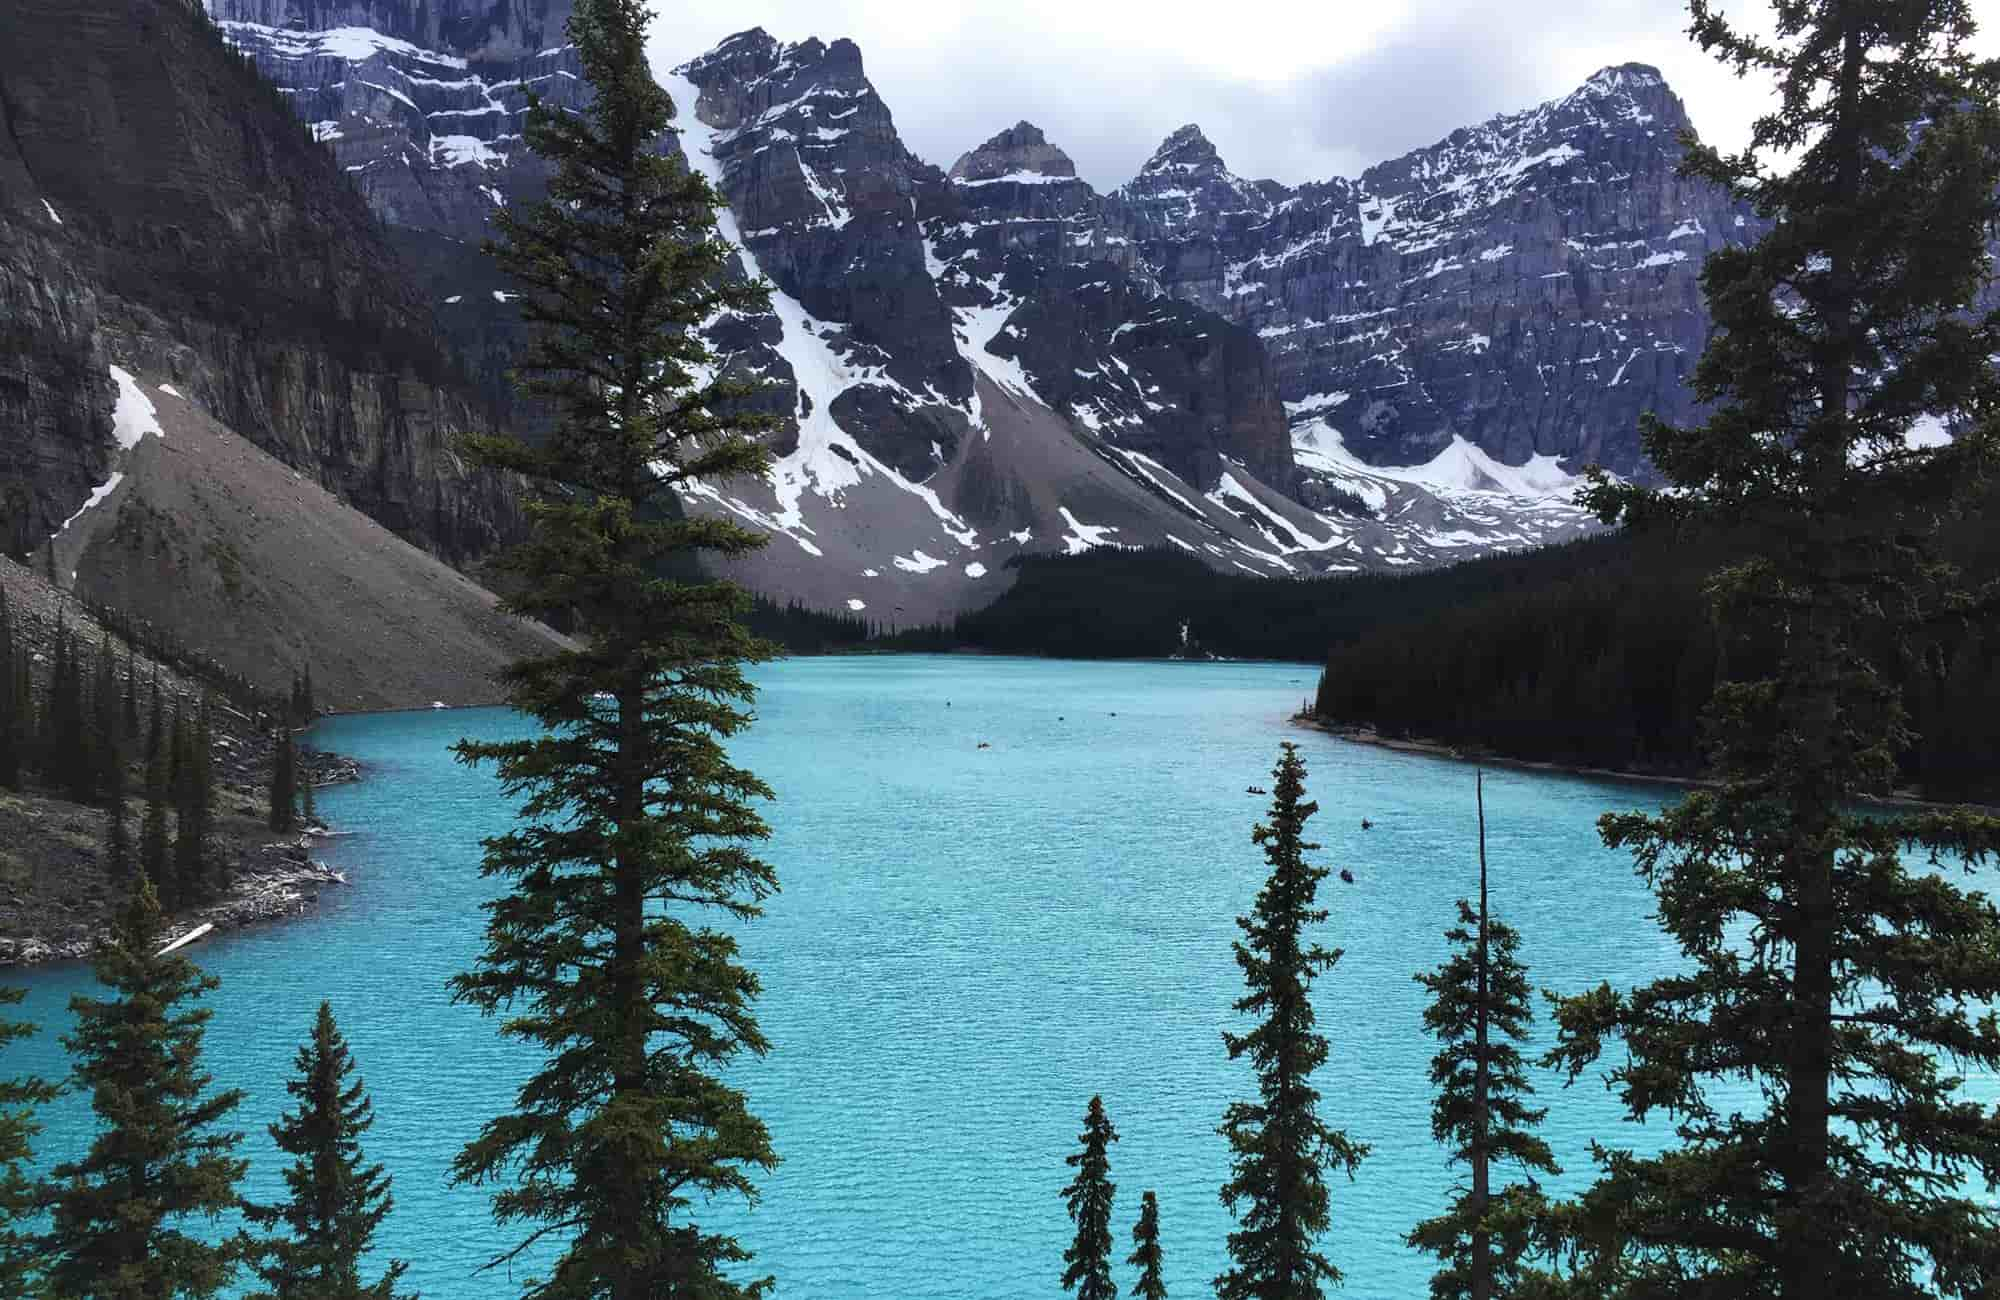 Voyage au Canada - Lac Moraine - Amplitudes